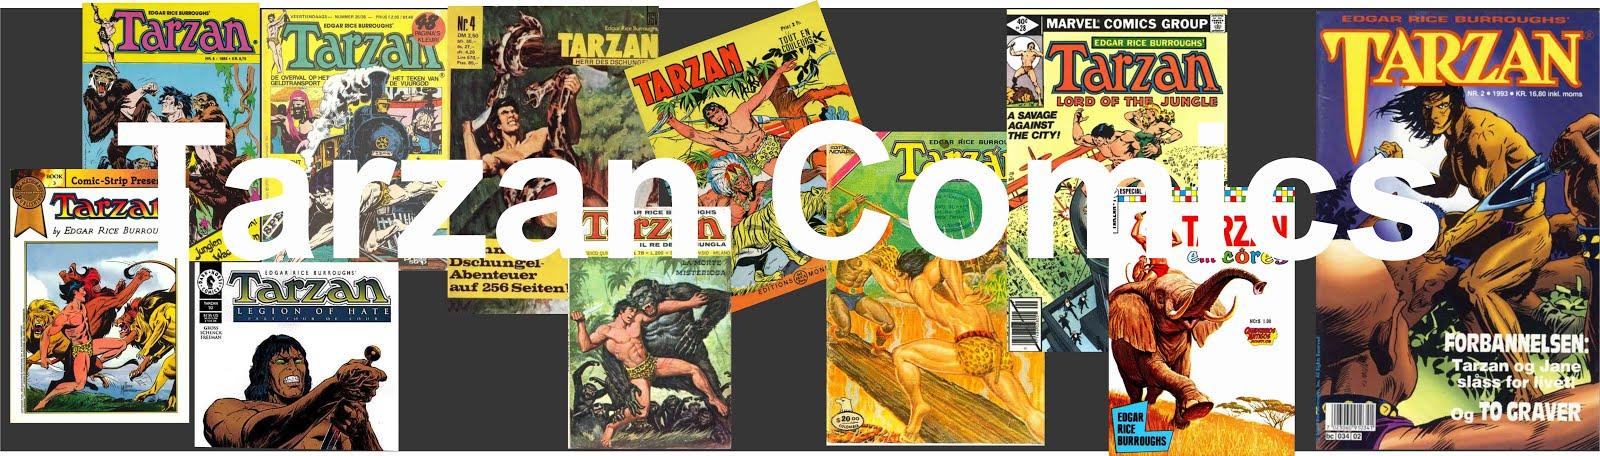 TarzanComics